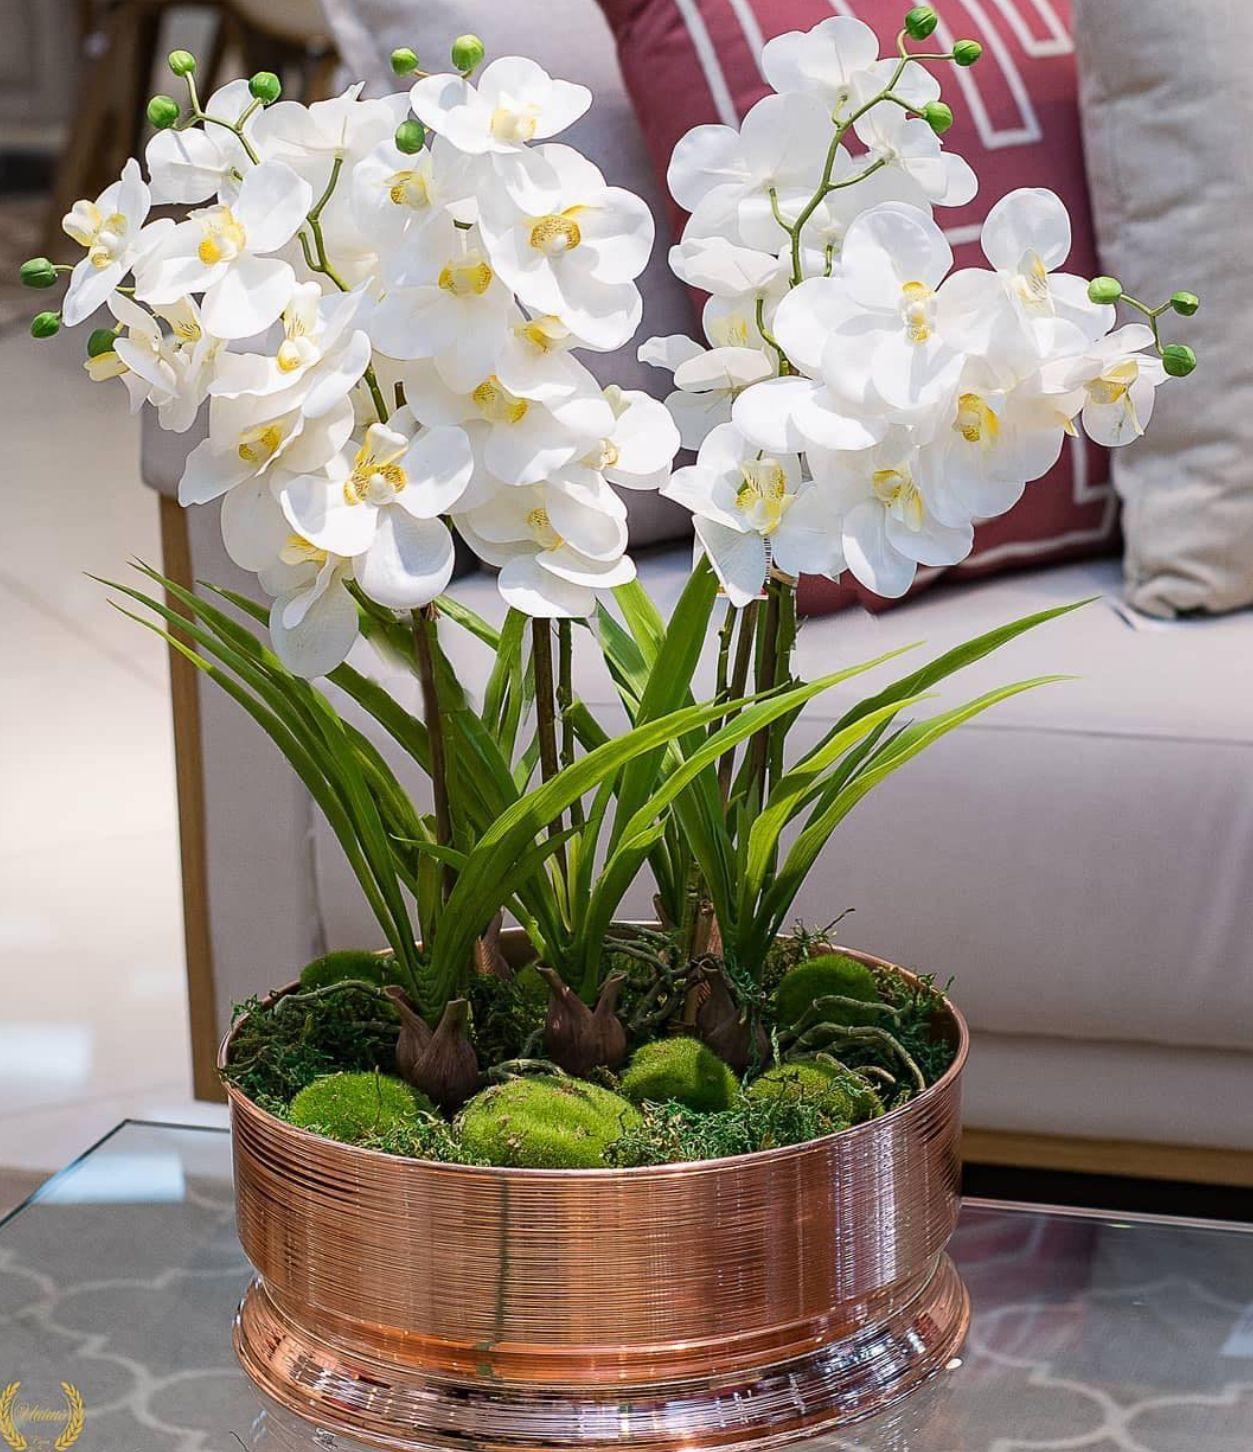 Pin De Tina Menon Em Flowers Arrengement Com Imagens Aranjos